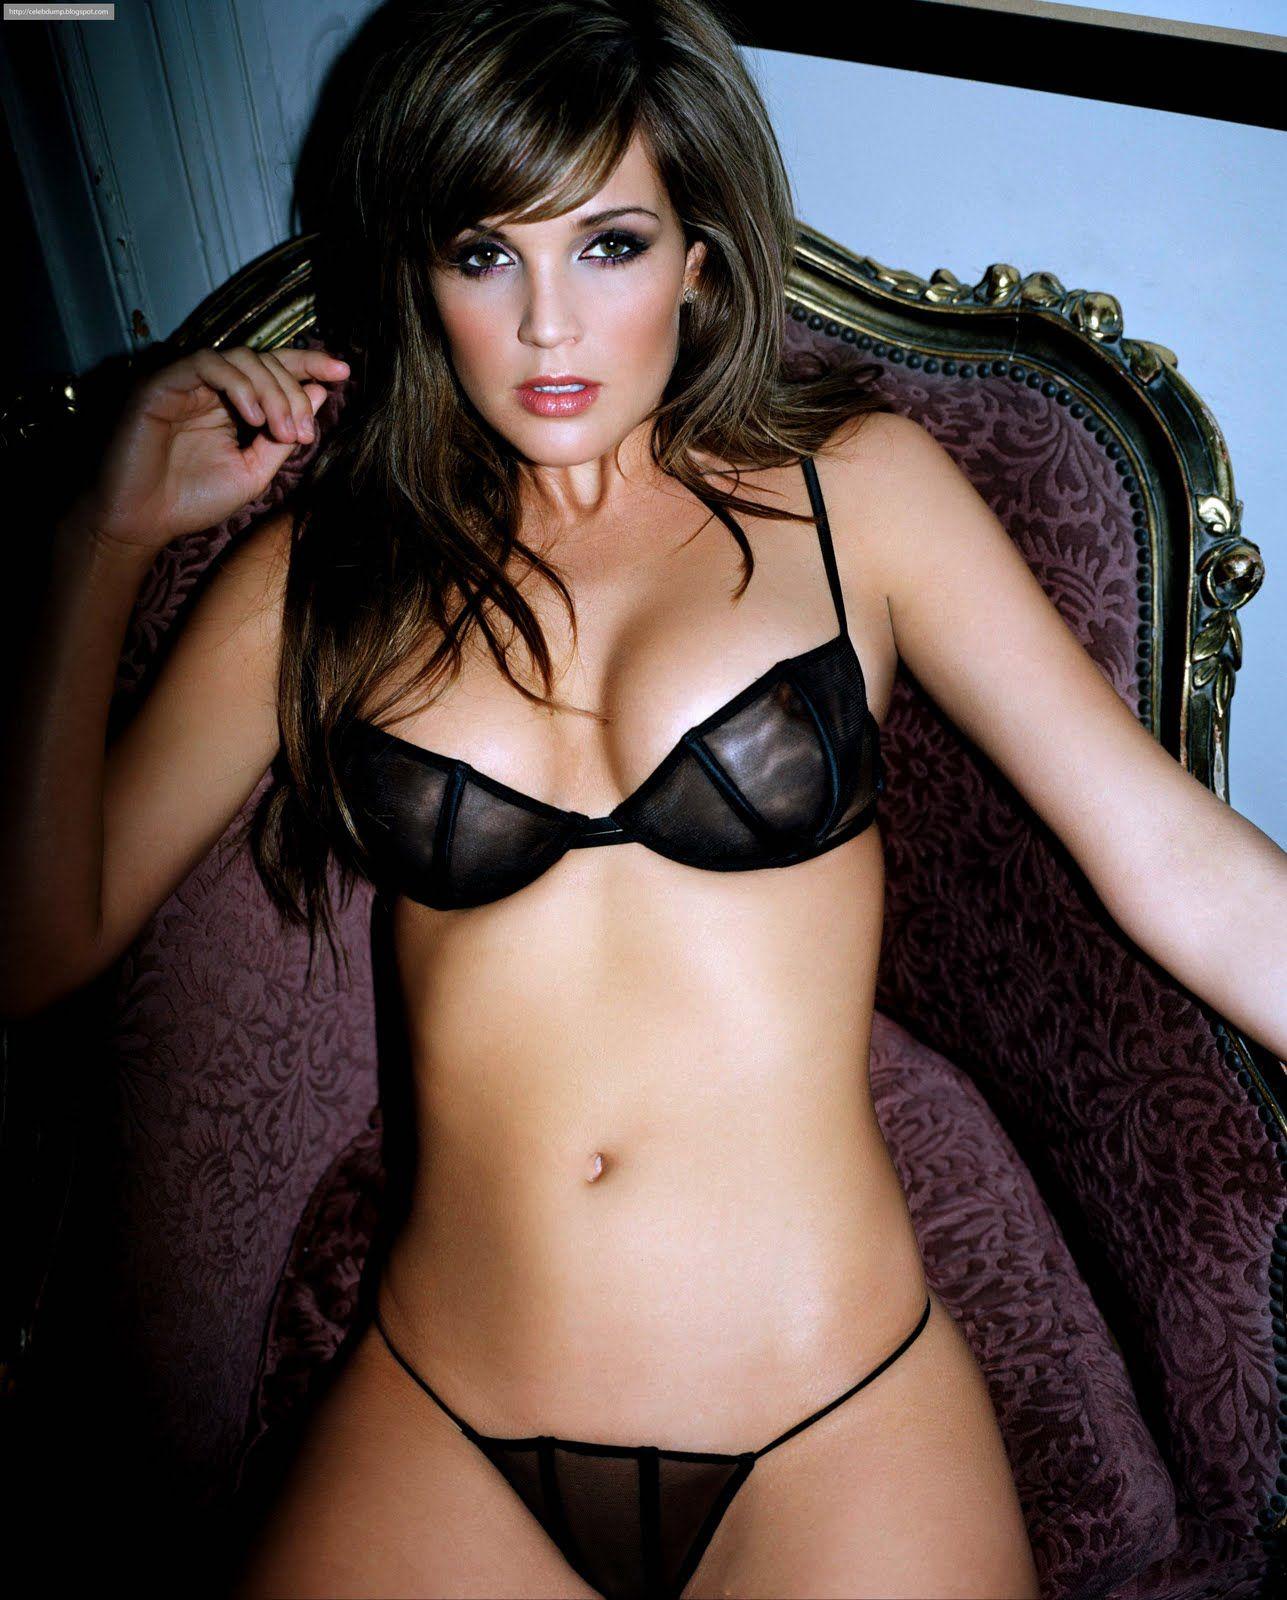 Danielle lloyd panties nude (52 photos), Fappening Celebrity image